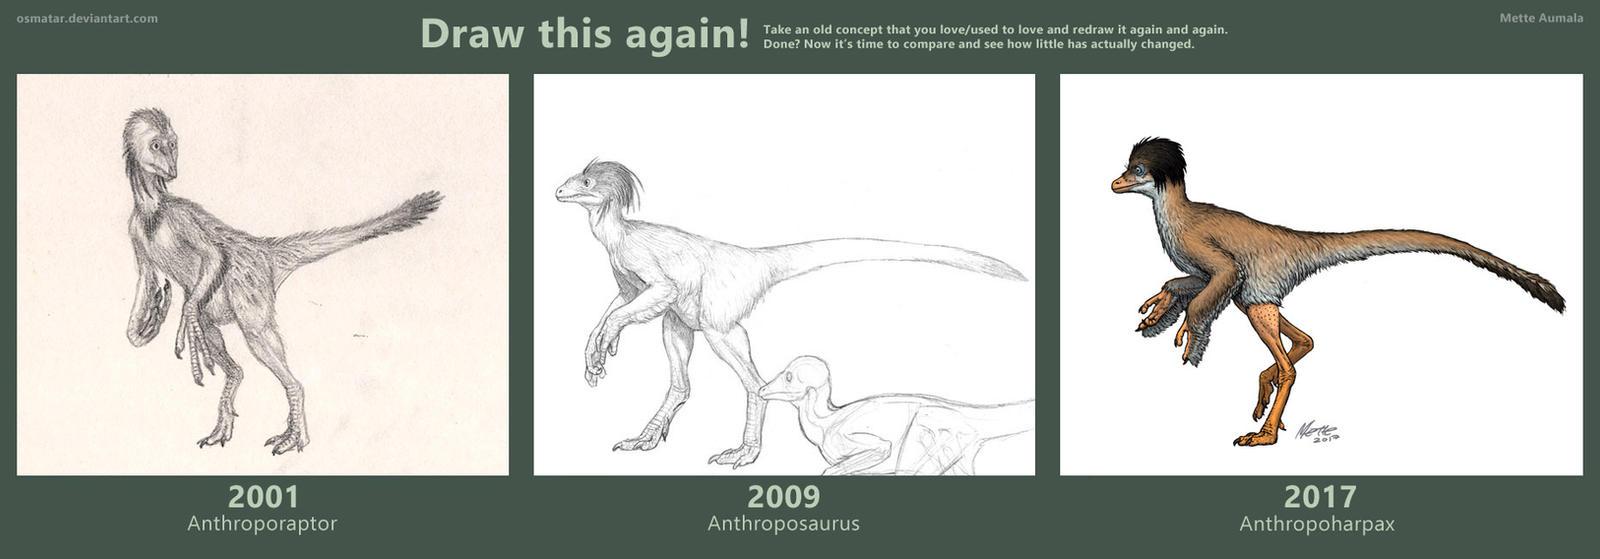 Dinosauroid: Reckoning by Osmatar